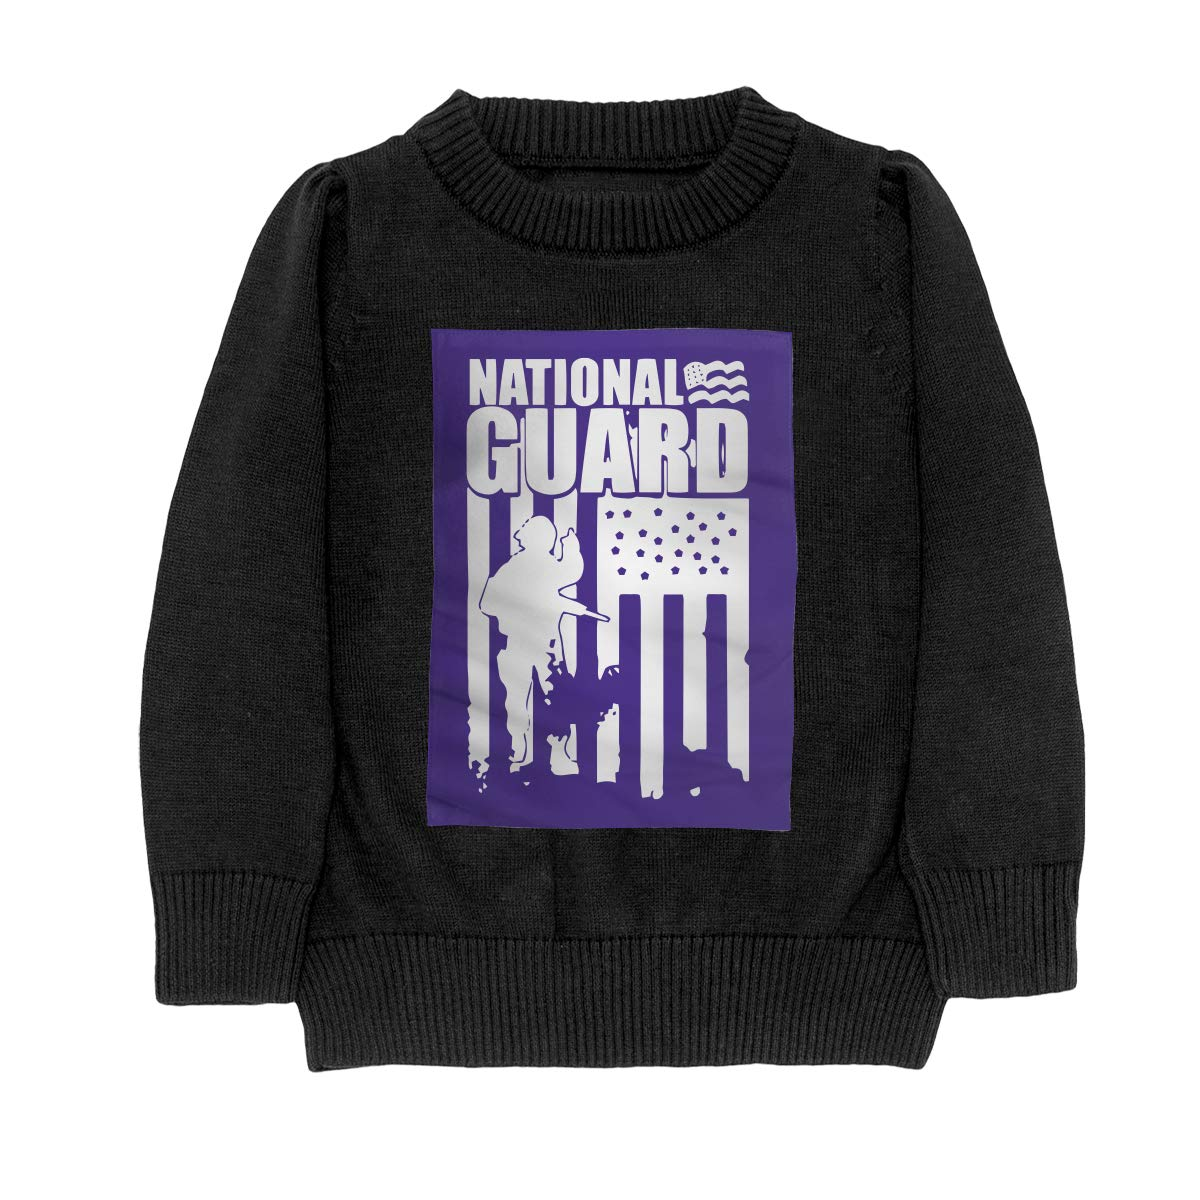 National Guard Patriotic Army American Flag Fashion Teenager Boys /& Girls Unisex Sweater Keep Warm